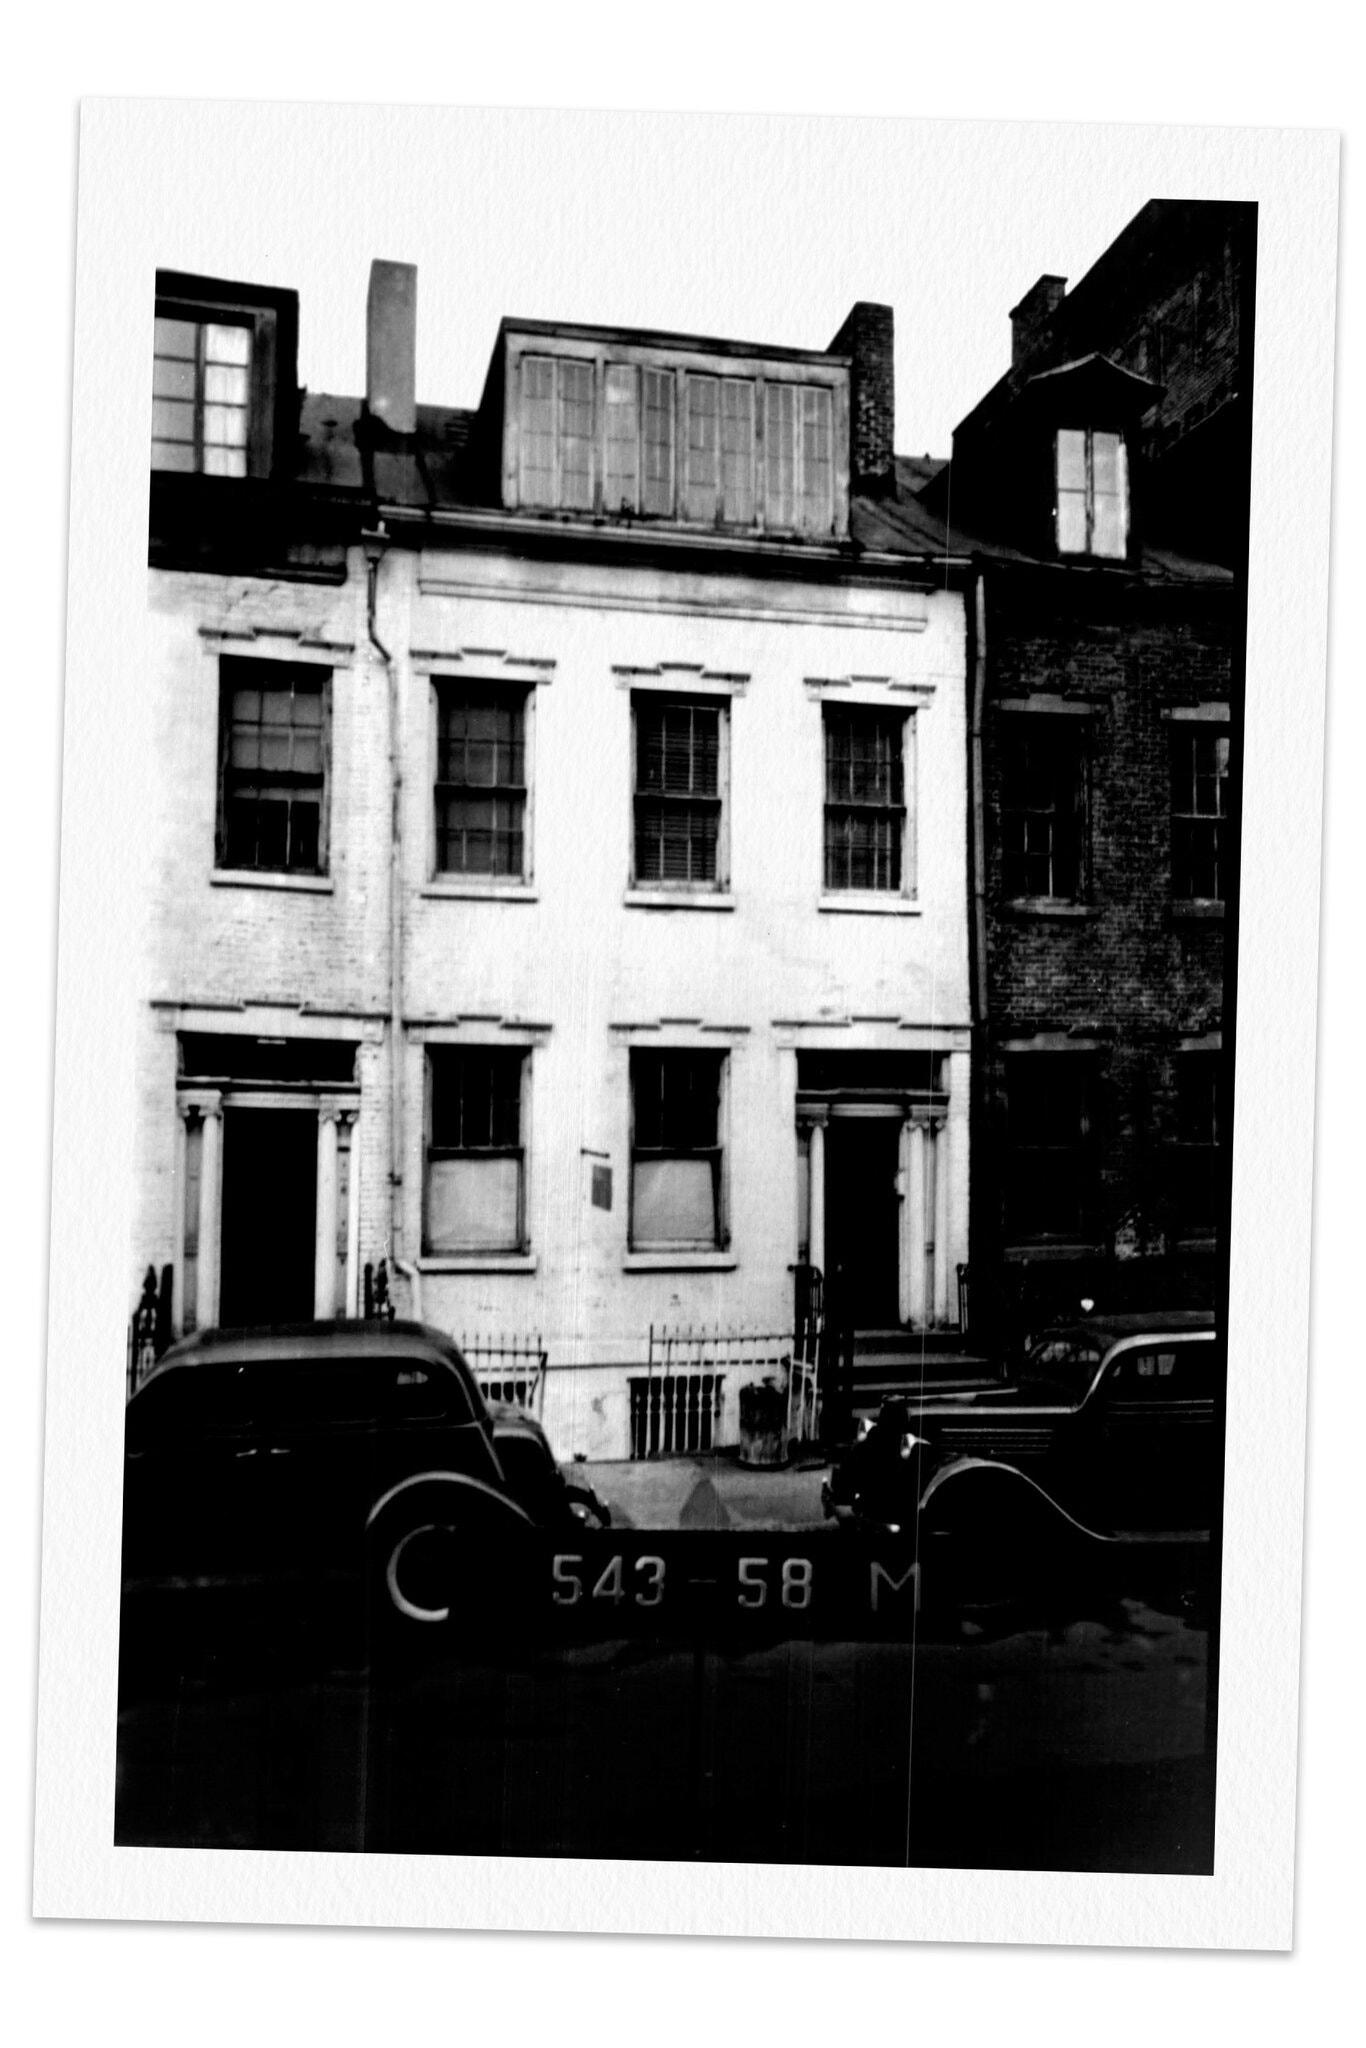 Adams's Greenwich Village tearoom, Eve's Hangout, photographed in 1939.